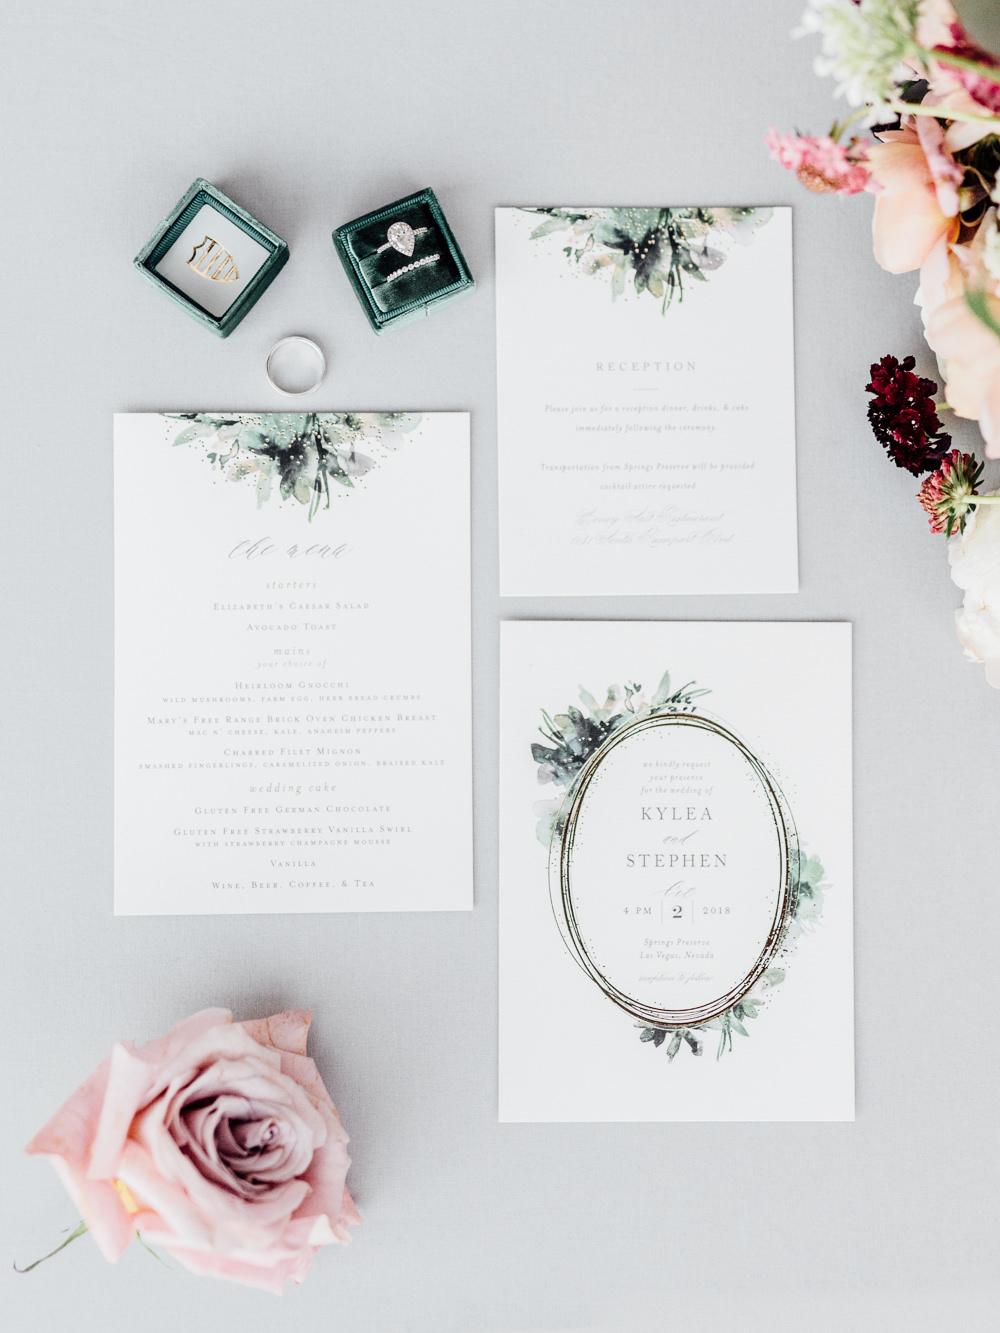 Botanical Greenery Stationery Invitations Flat Lay Romantic Soft Elopement Wedding Las Vegas Kristen Joy Photography